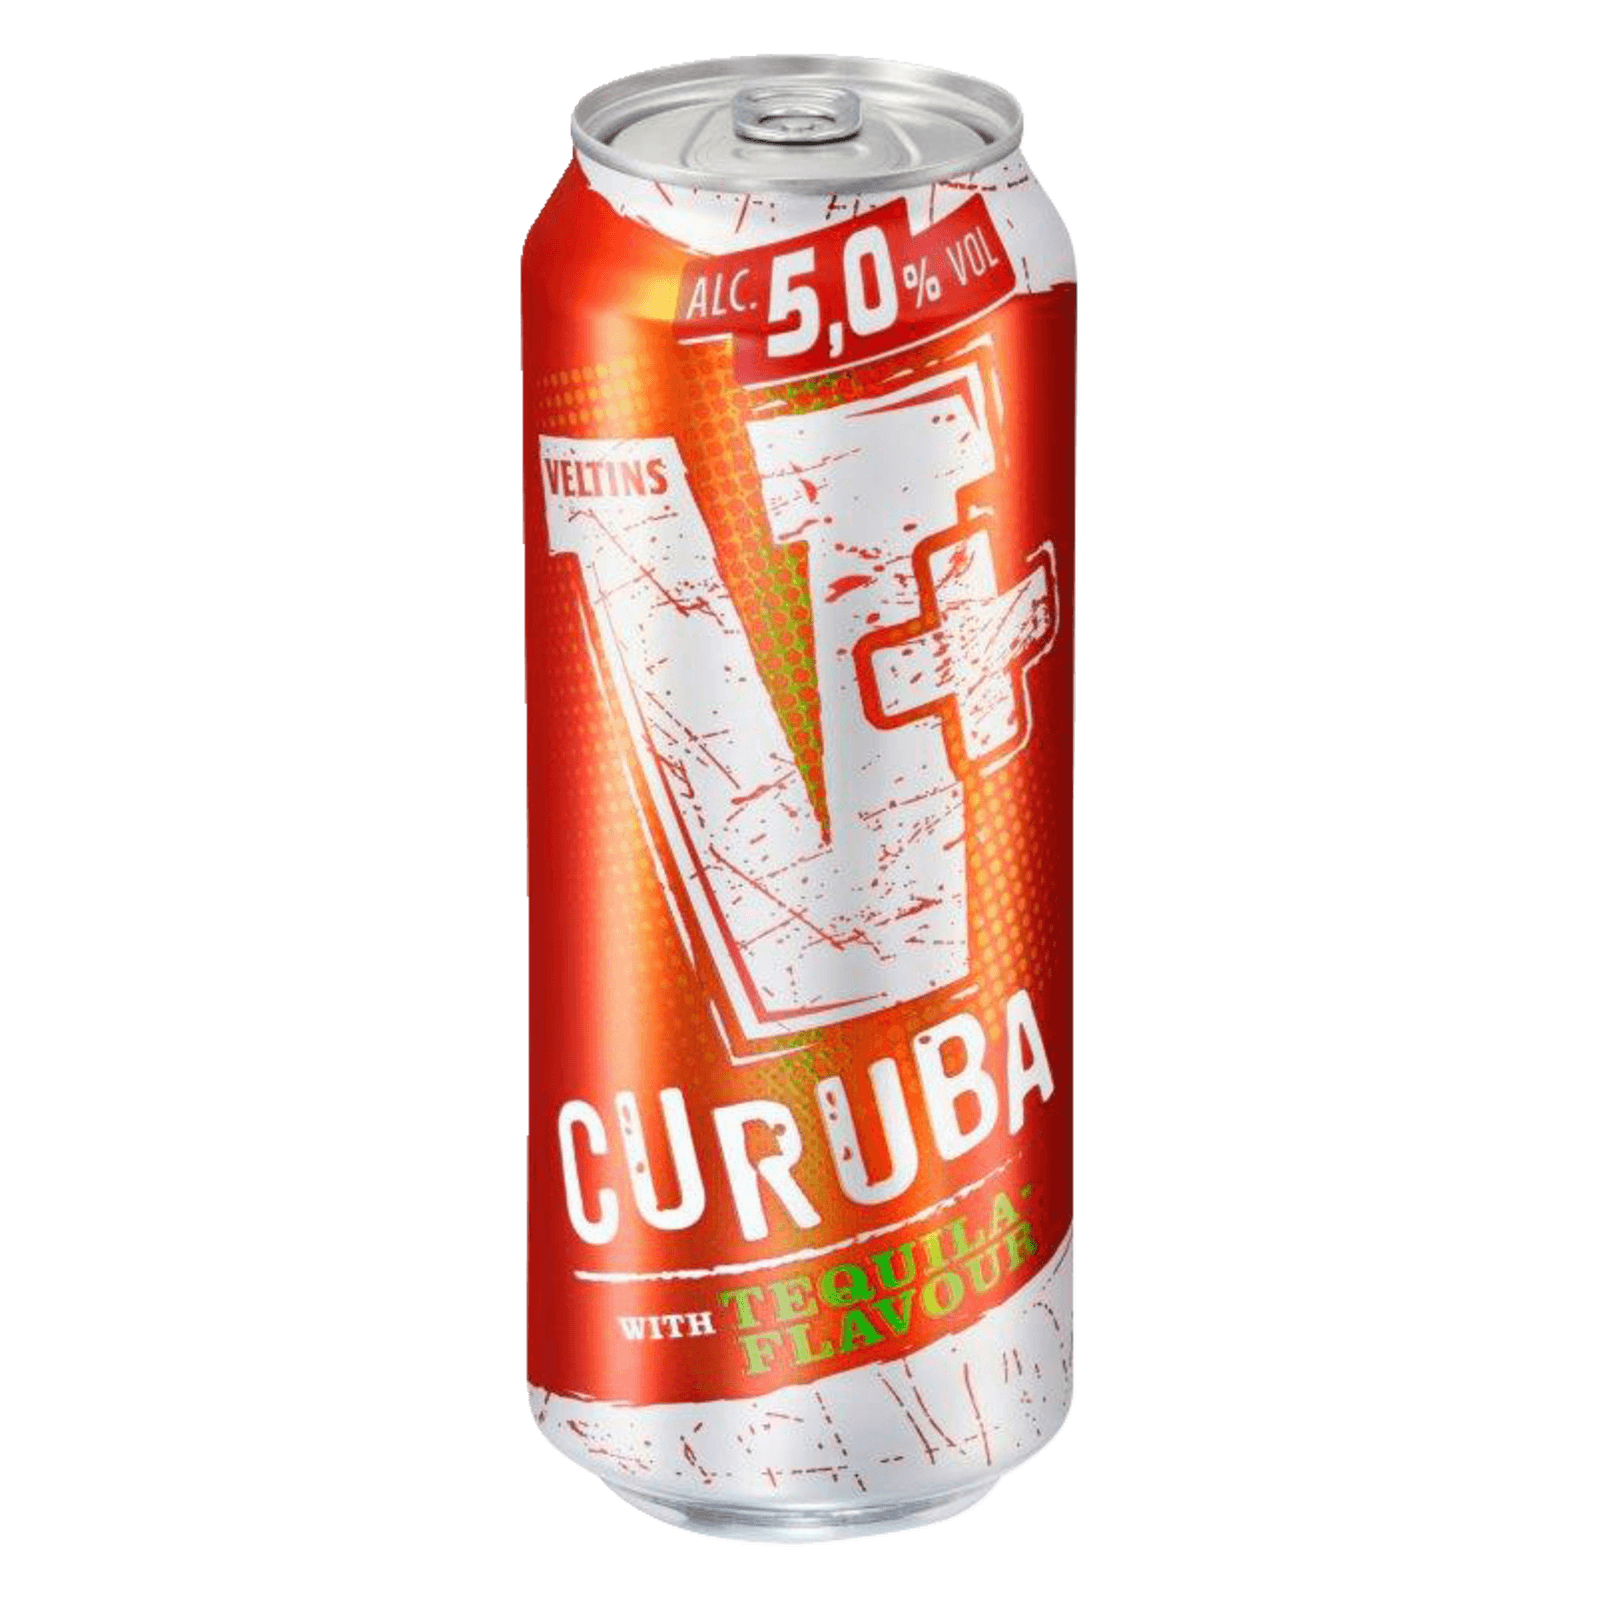 Veltins V Curuba 05l